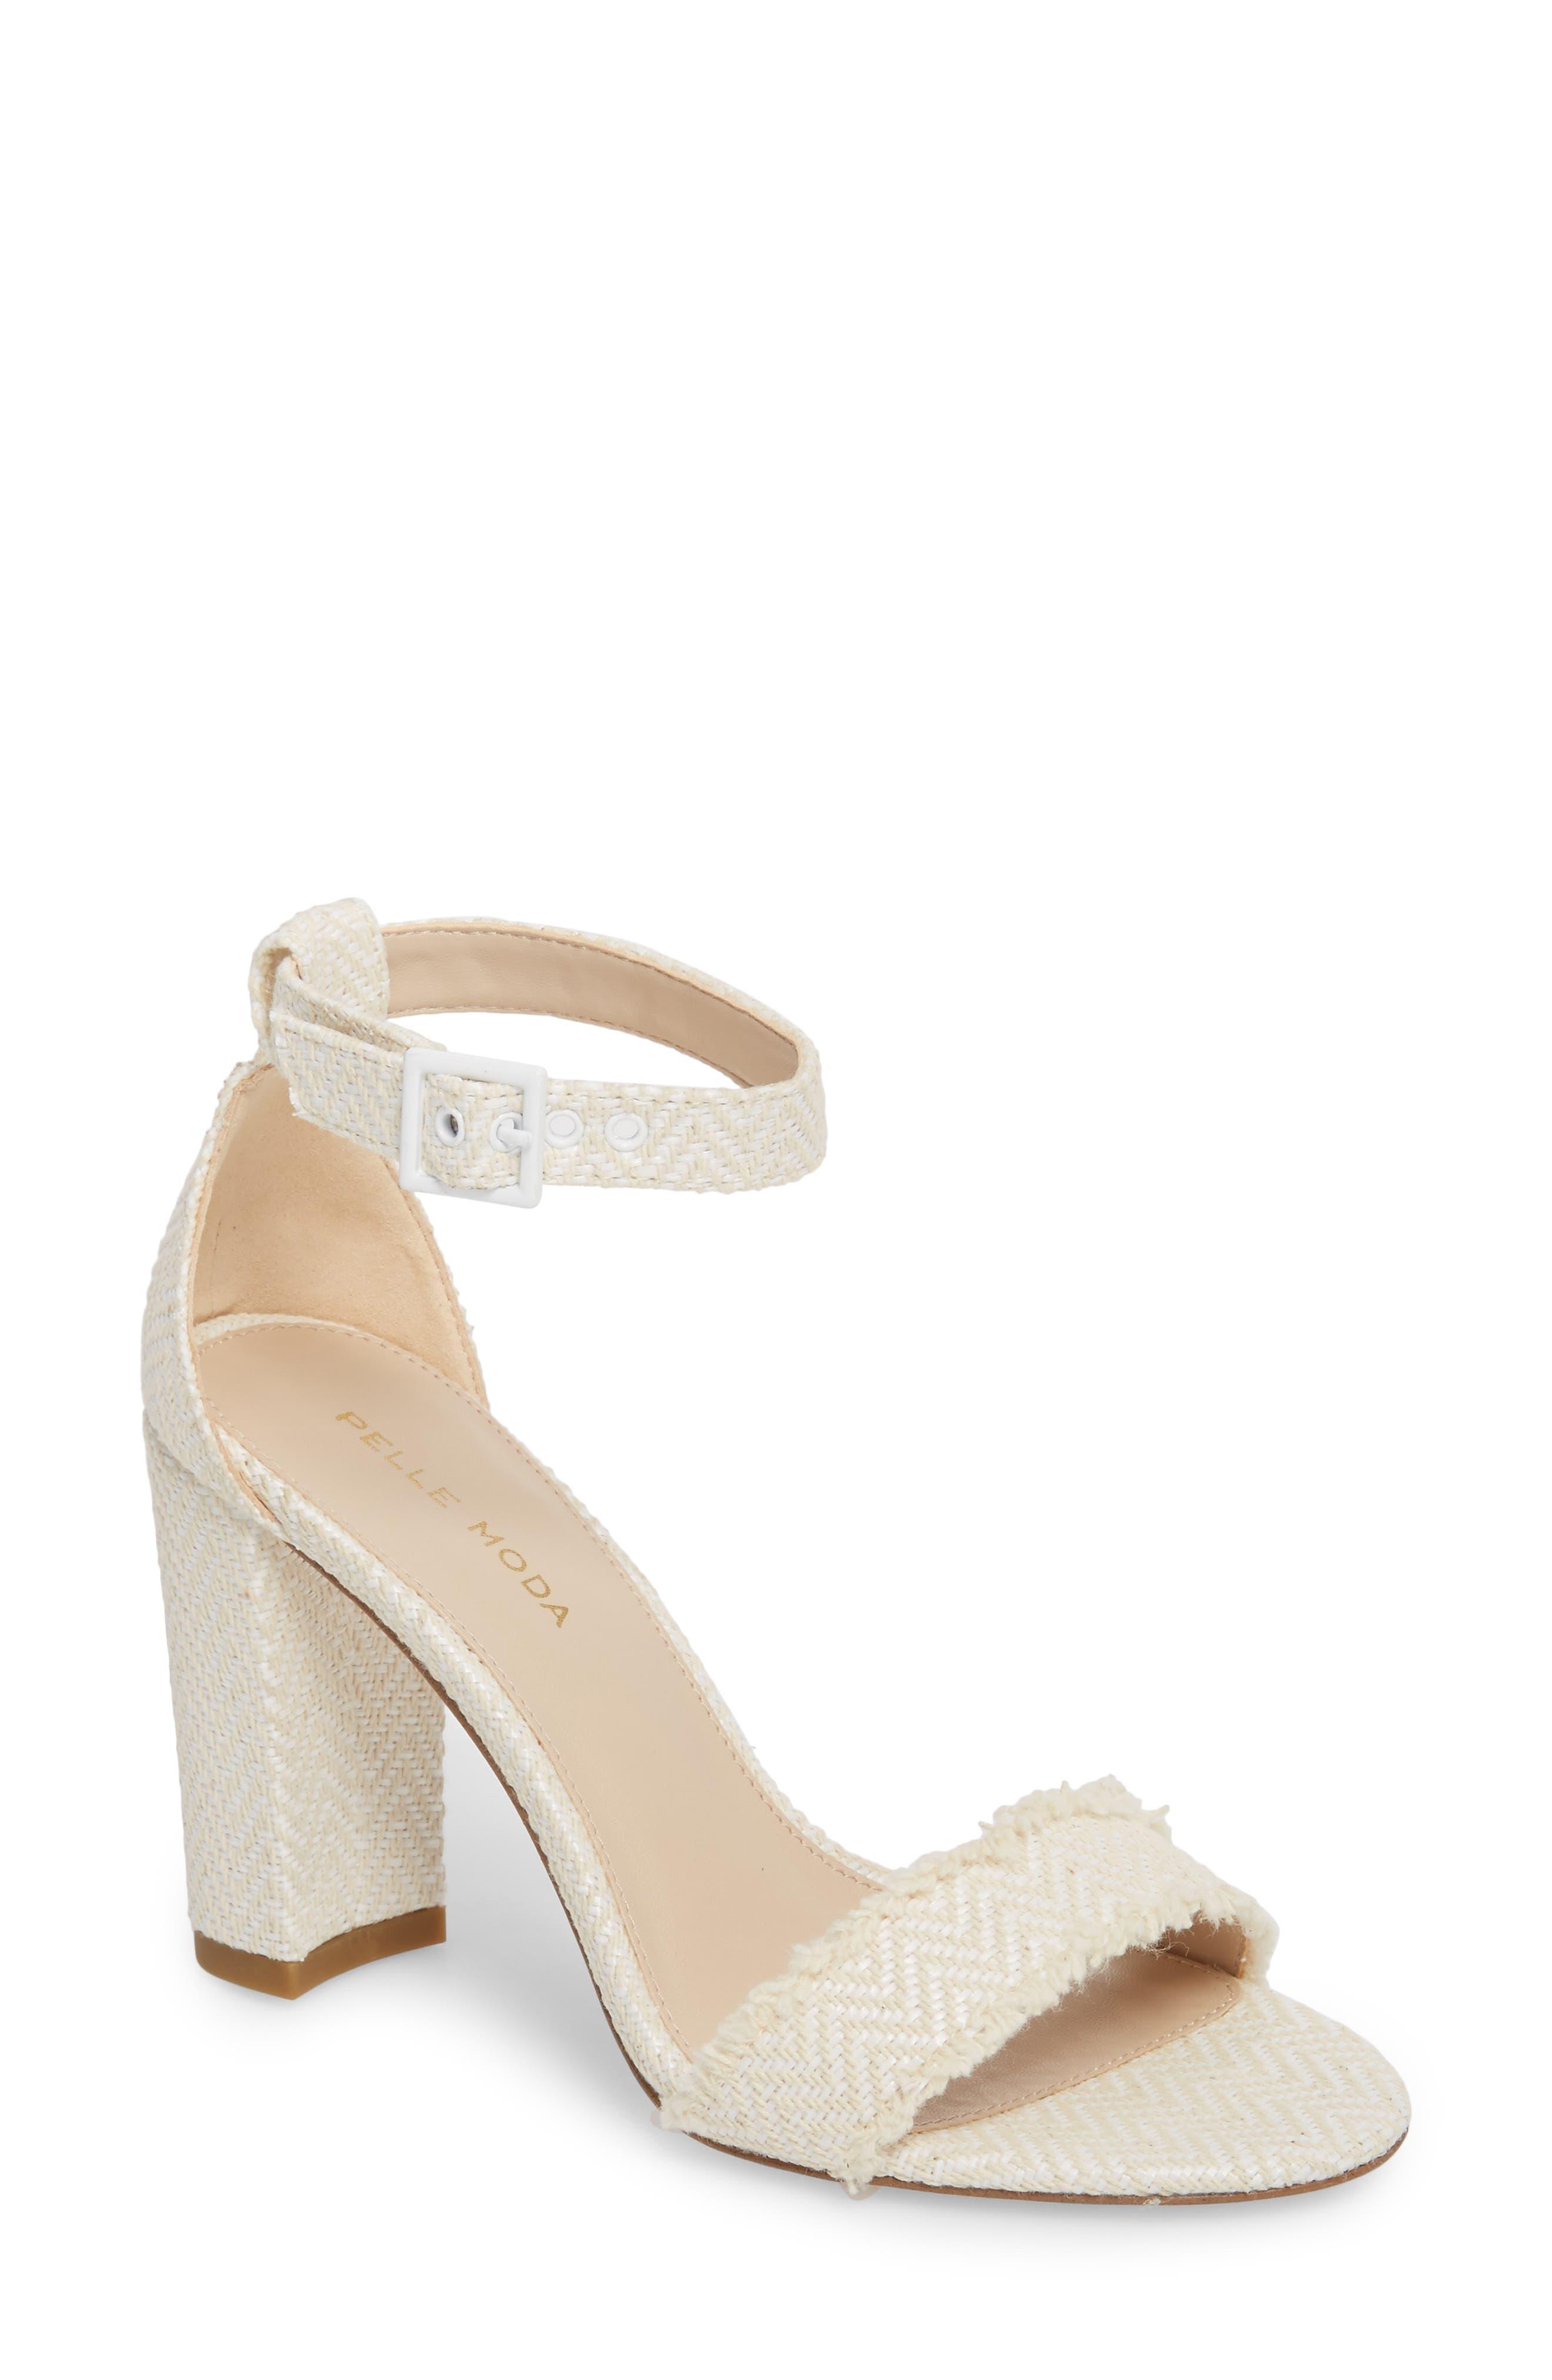 Bonnie Ankle Strap Sandal,                         Main,                         color, White Herringbone